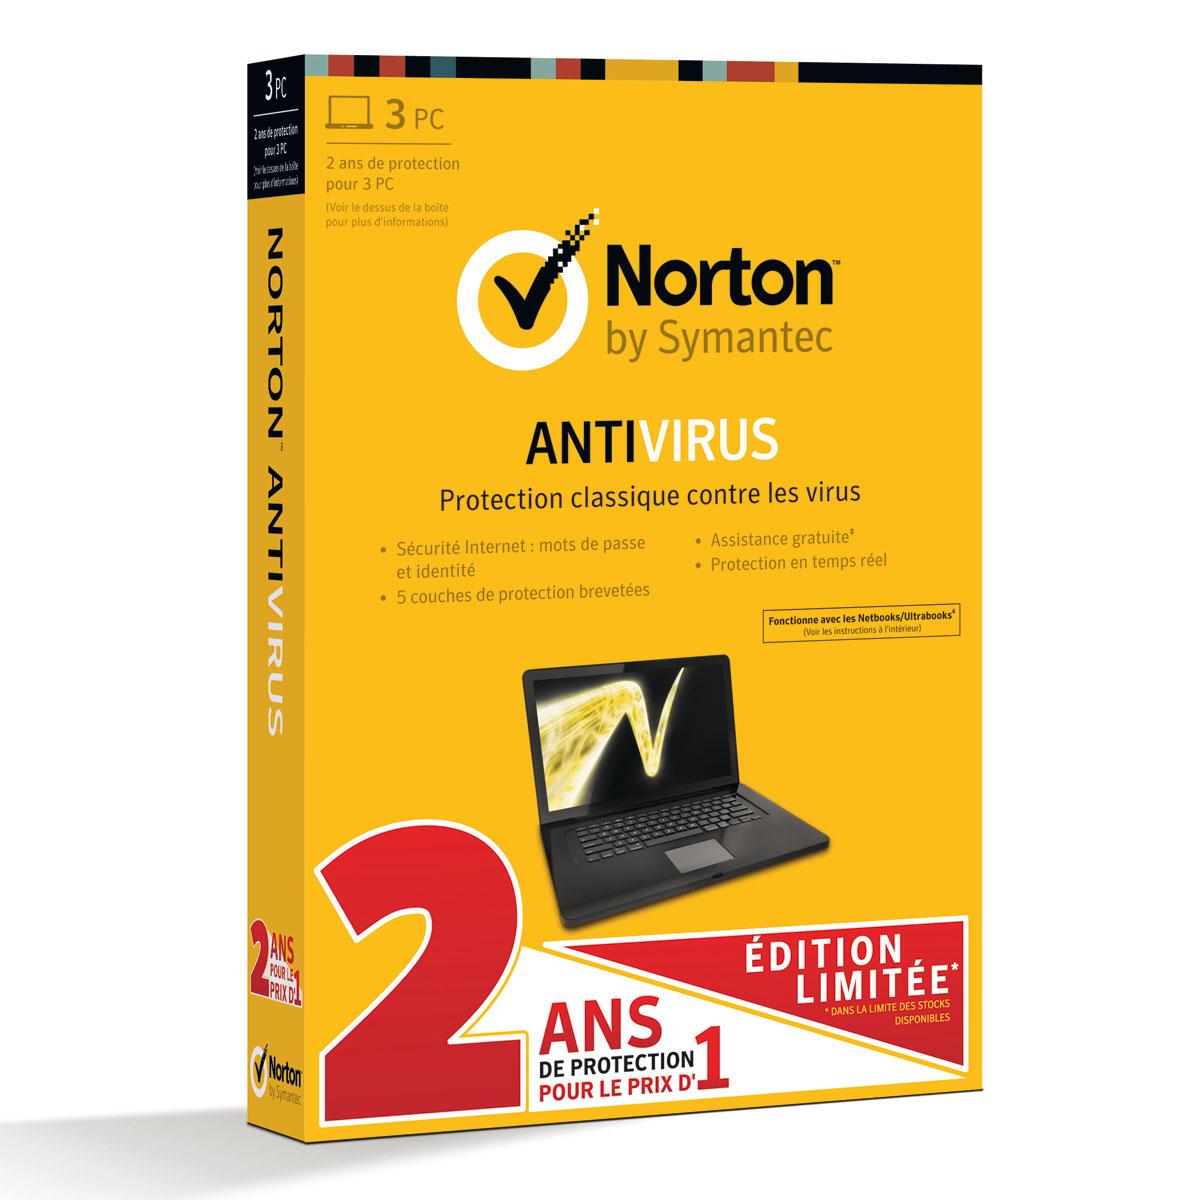 Norton Antivirus 2013 Edition Limit 233 E Licence 2 Ans 3